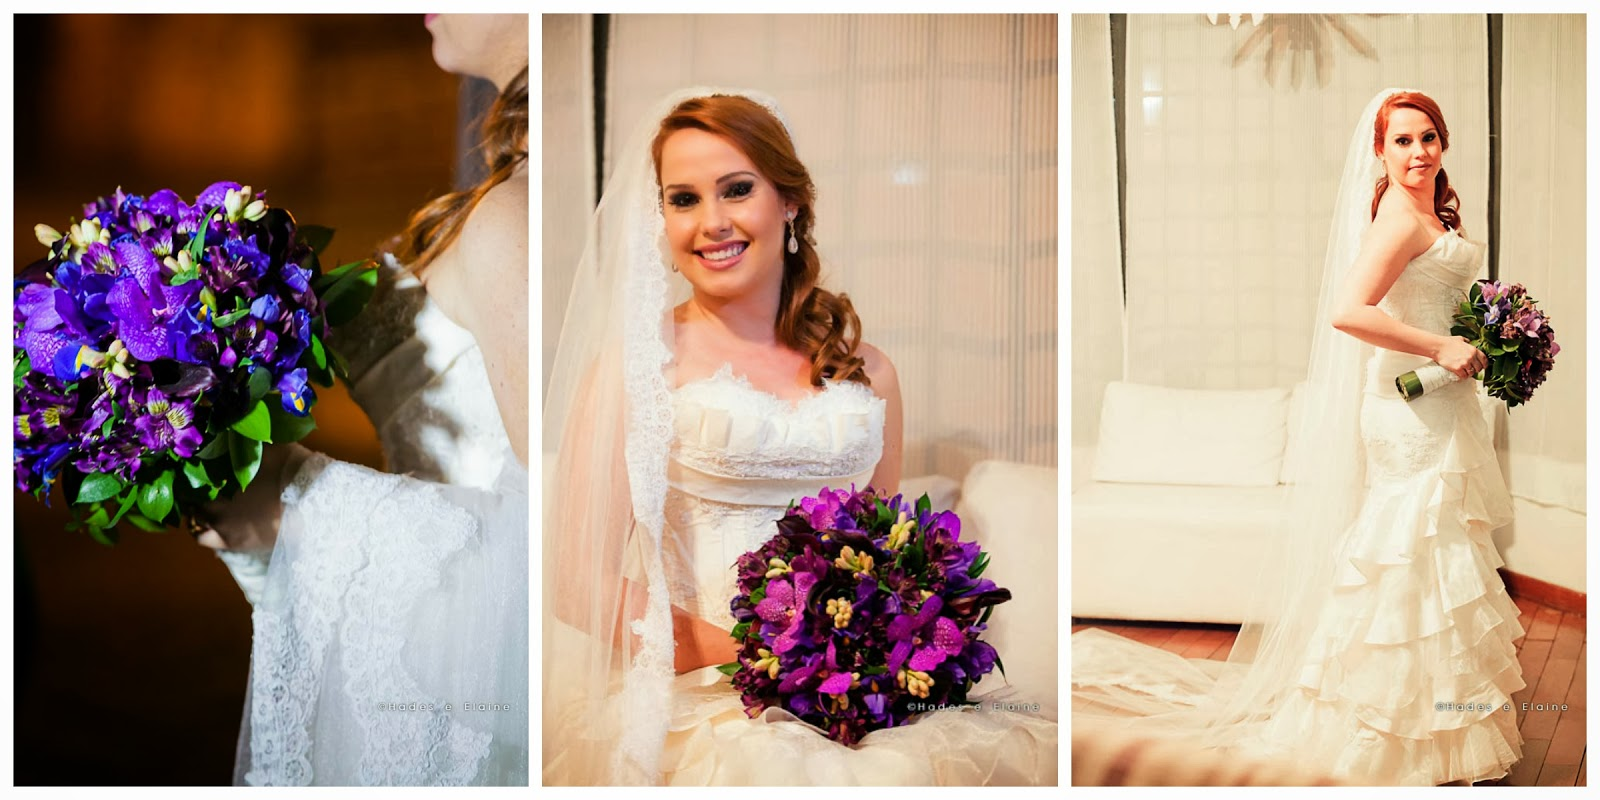 making of da noiva - dia da noiva - making of - noiva - vestido de noiva - bouquet